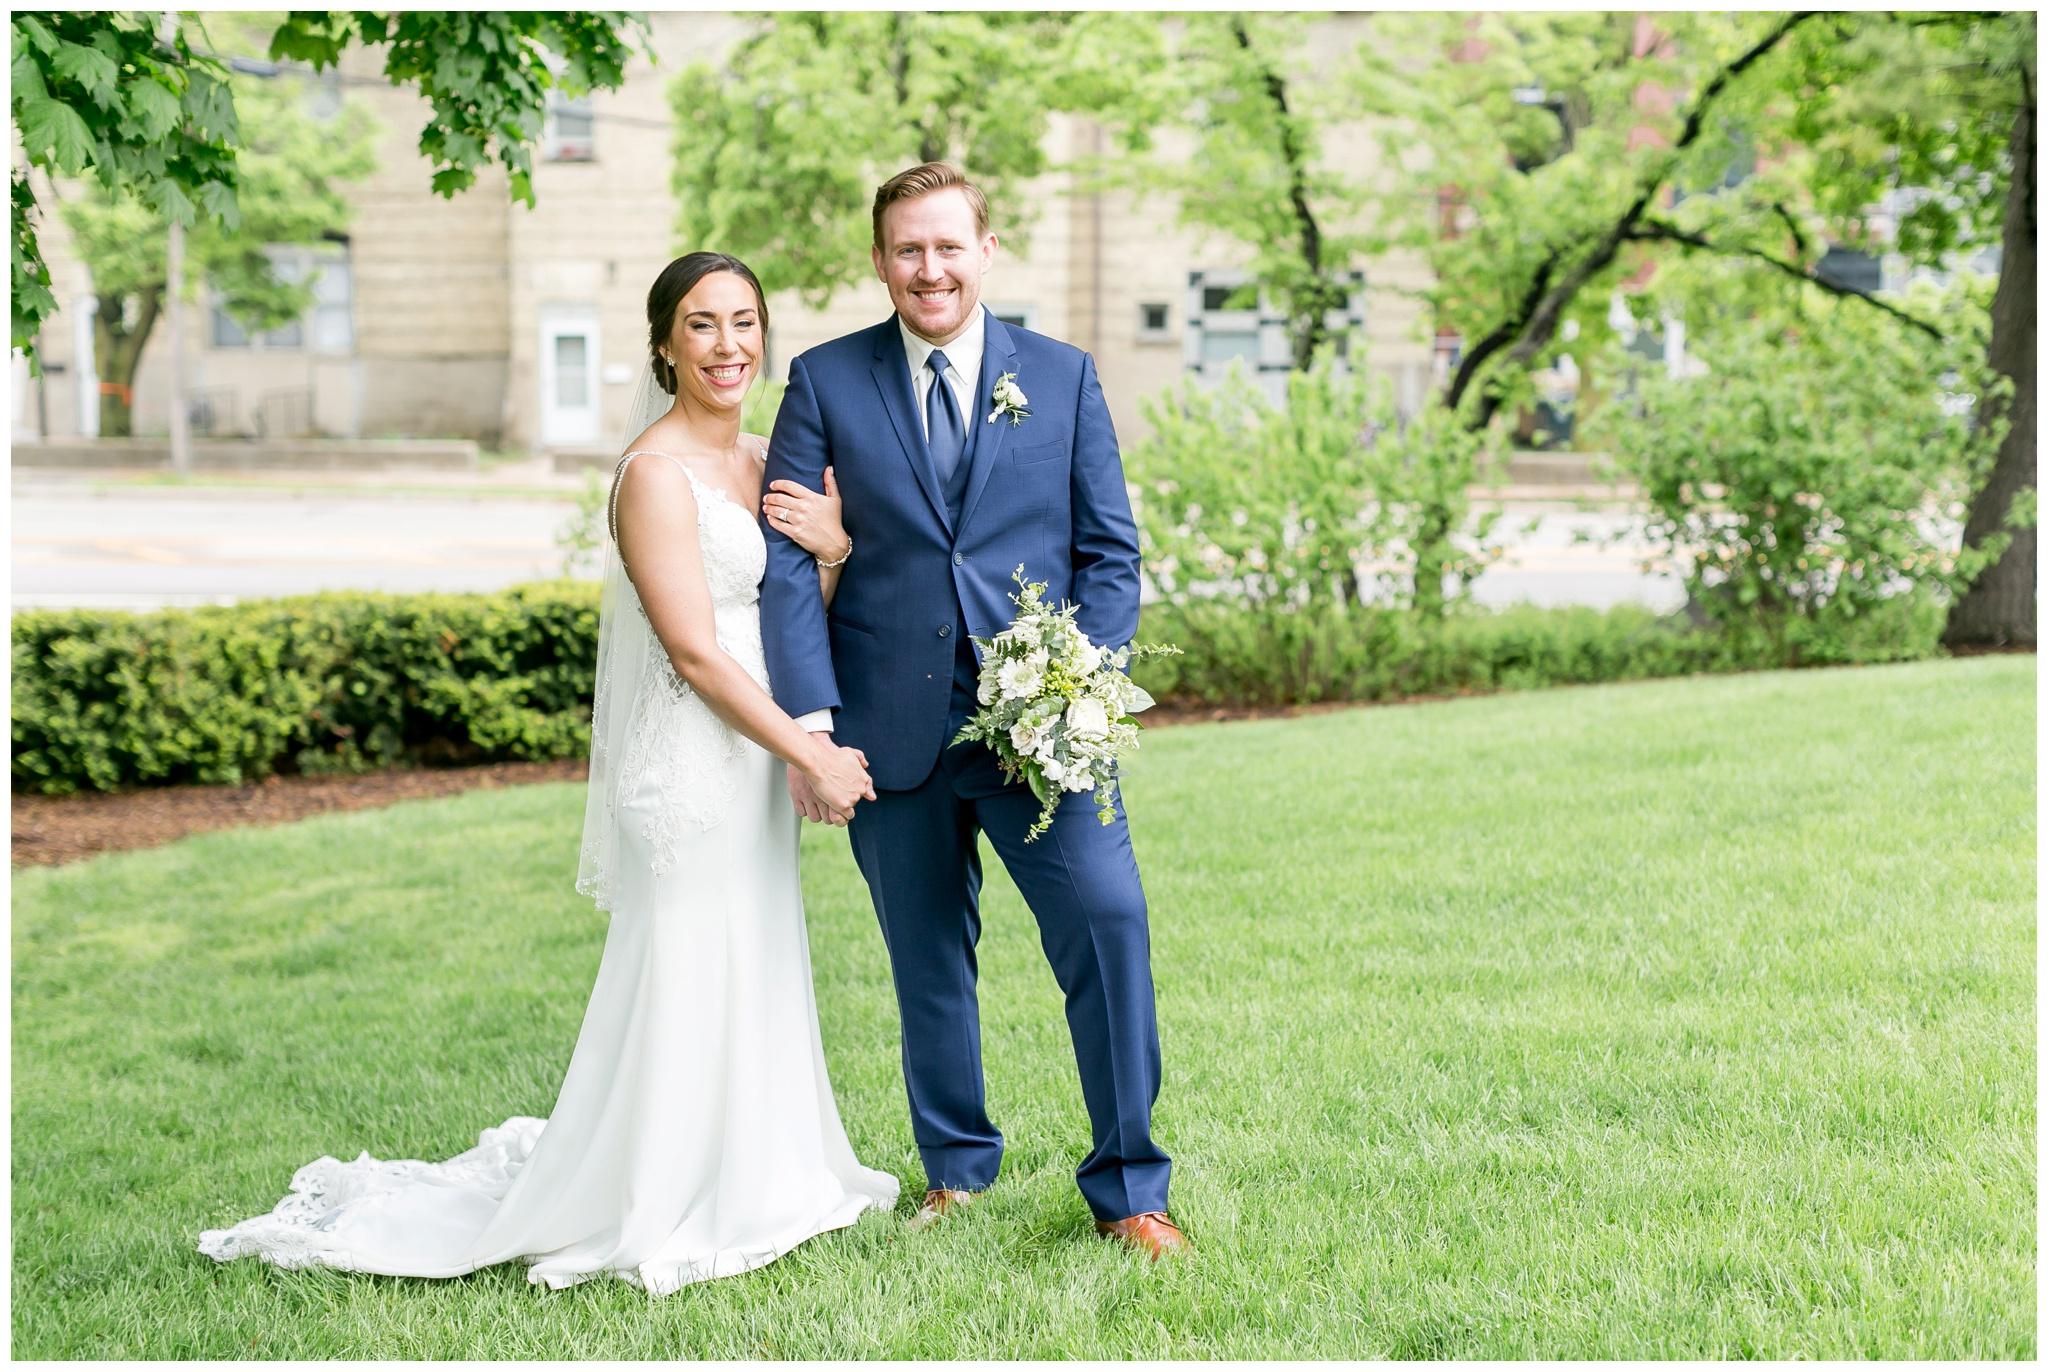 Union_south_Wedding_Madison_Wisconsin_Caynay_Photo_3644.jpg